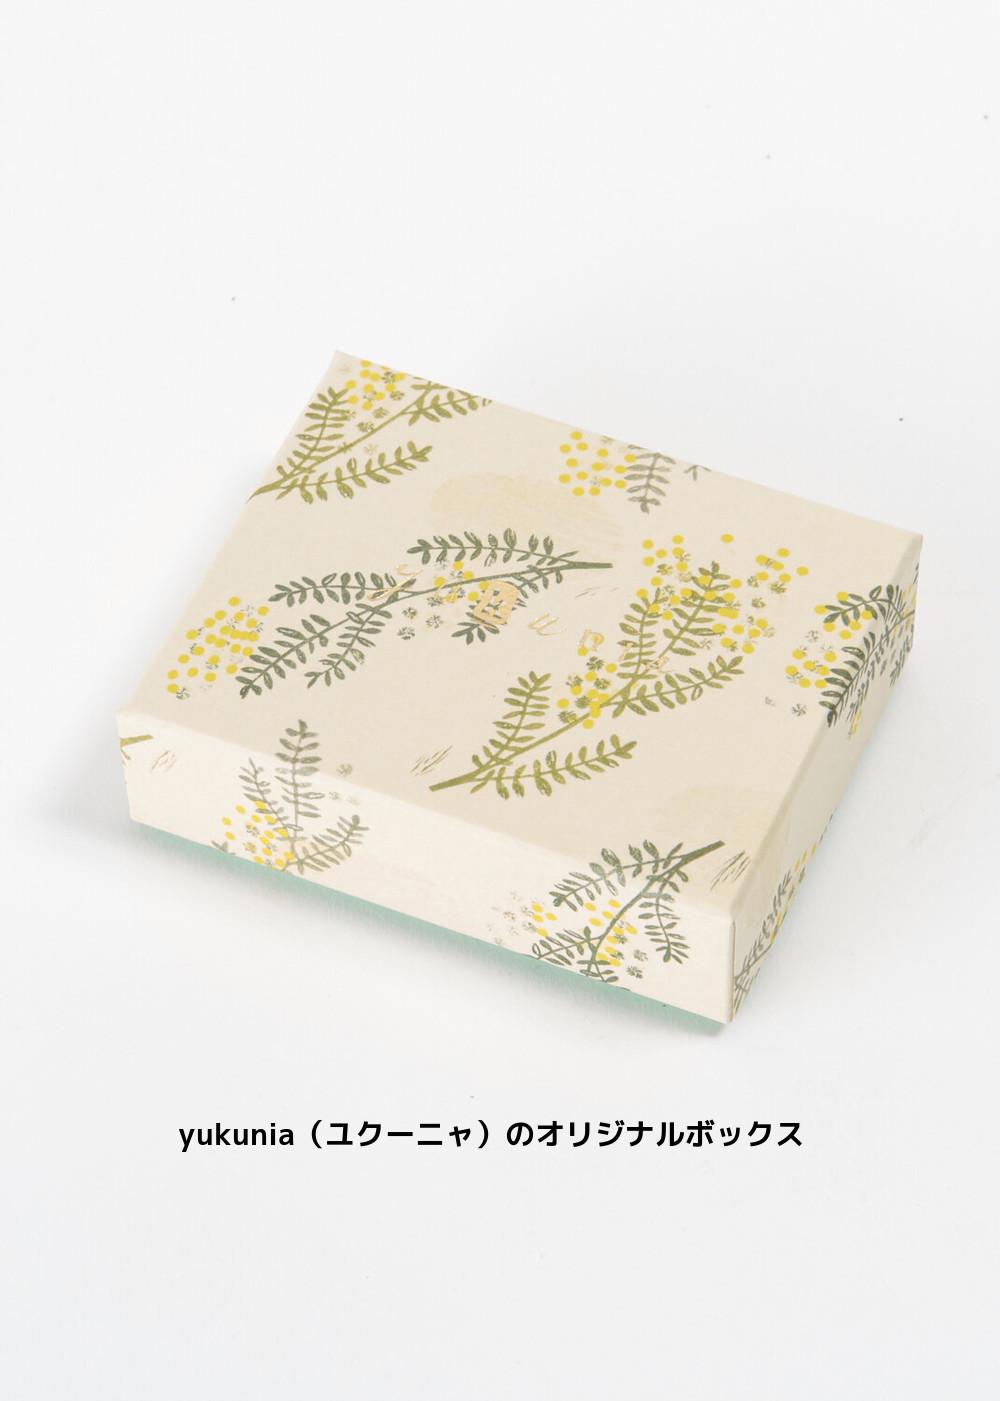 【yukunia】ユクーニャの『切手シリーズ』シェル